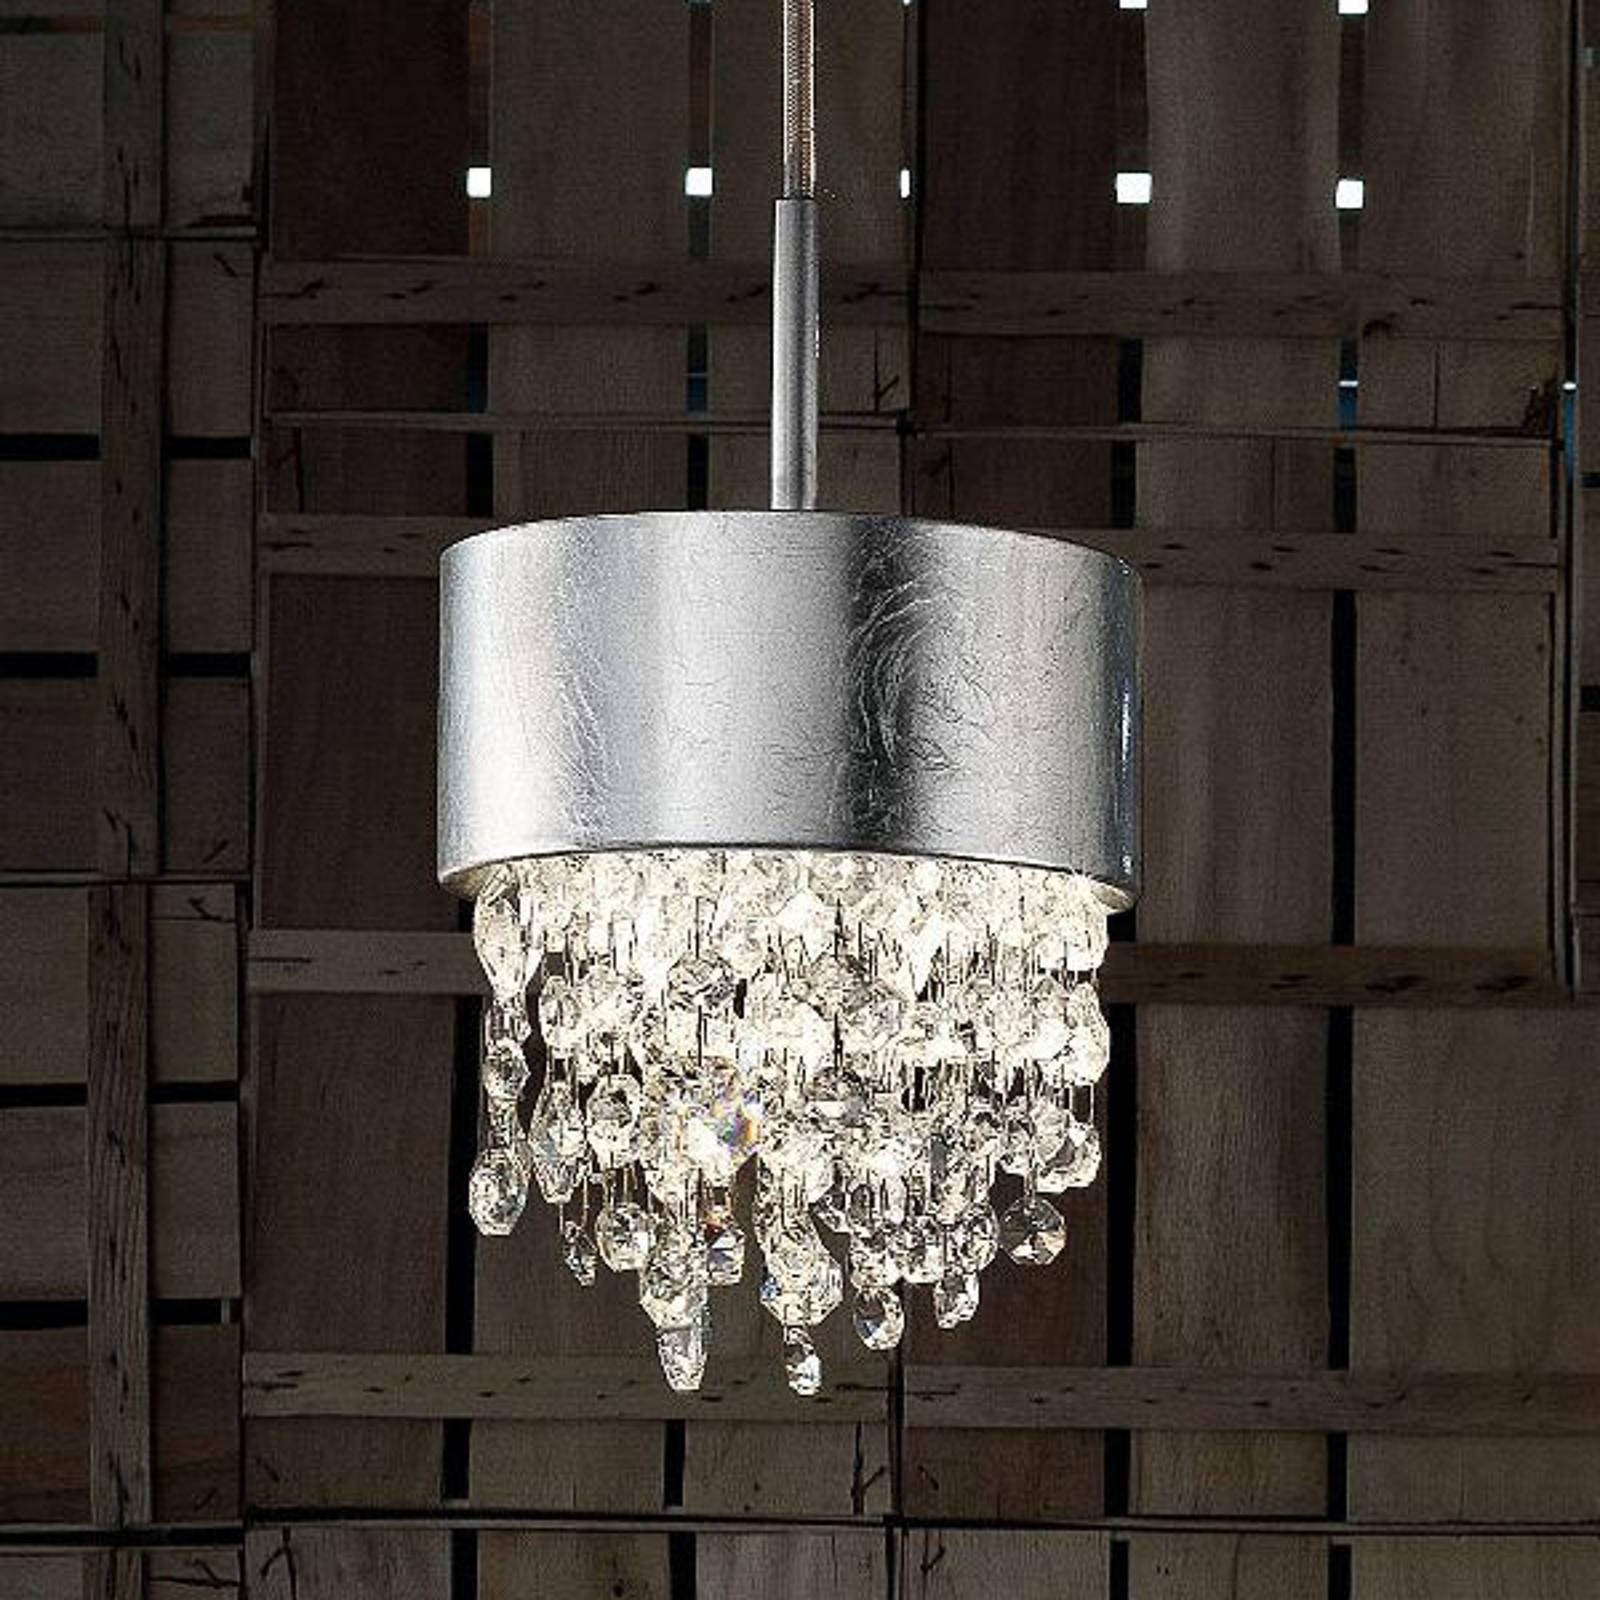 Lampa wisząca LED Olà S2 15, Ø15cm płatkowe srebro